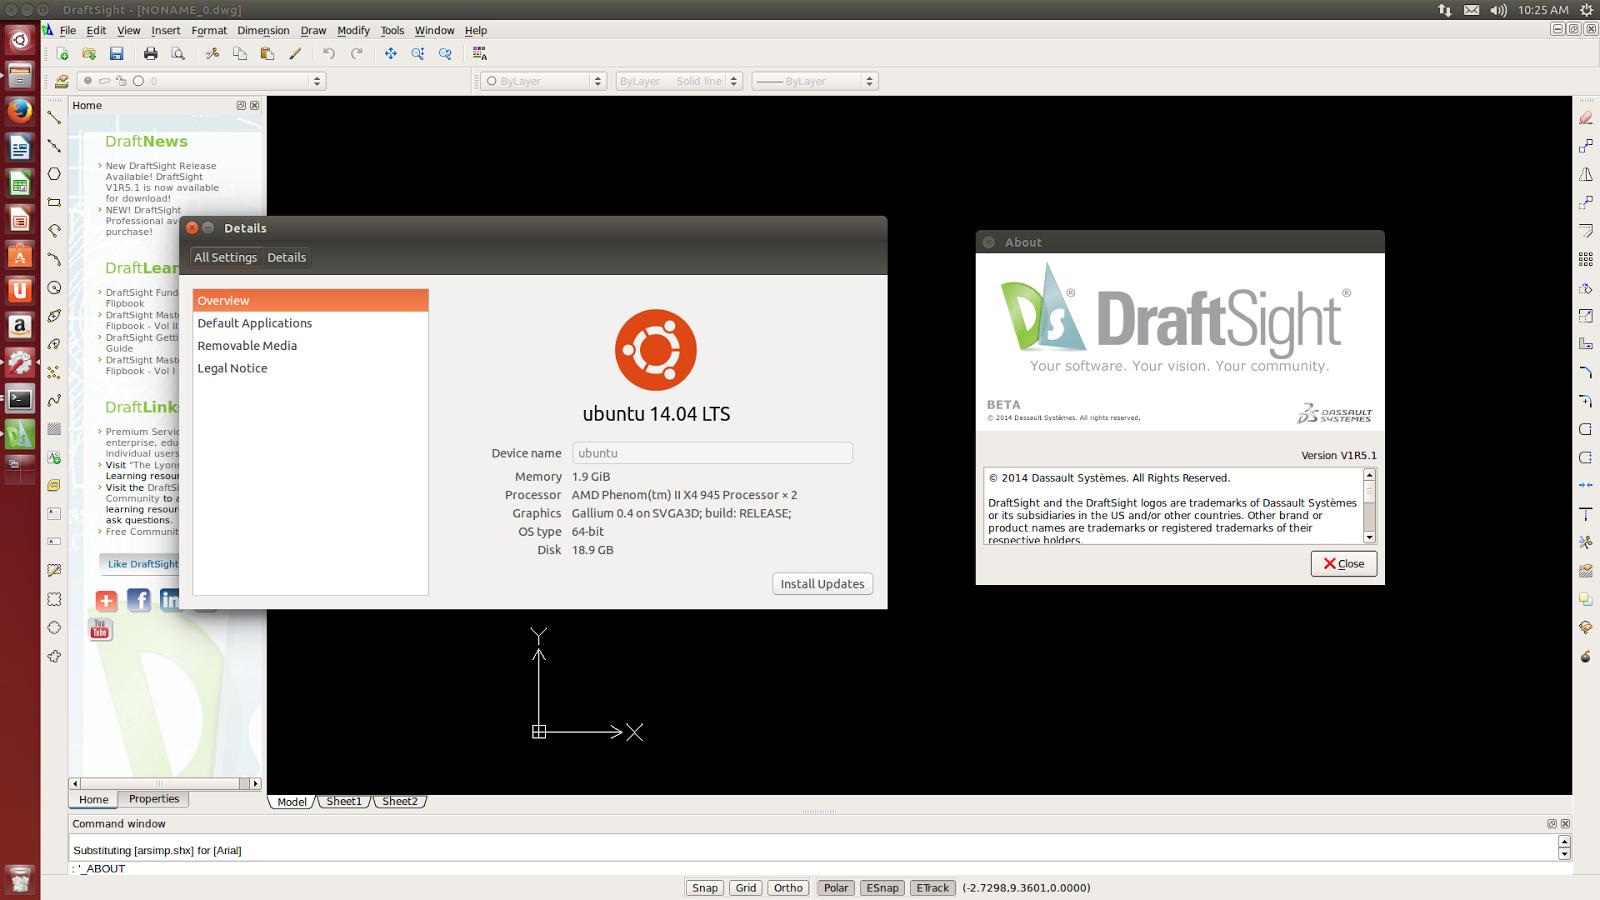 draftsight free download for windows 10 64 bit